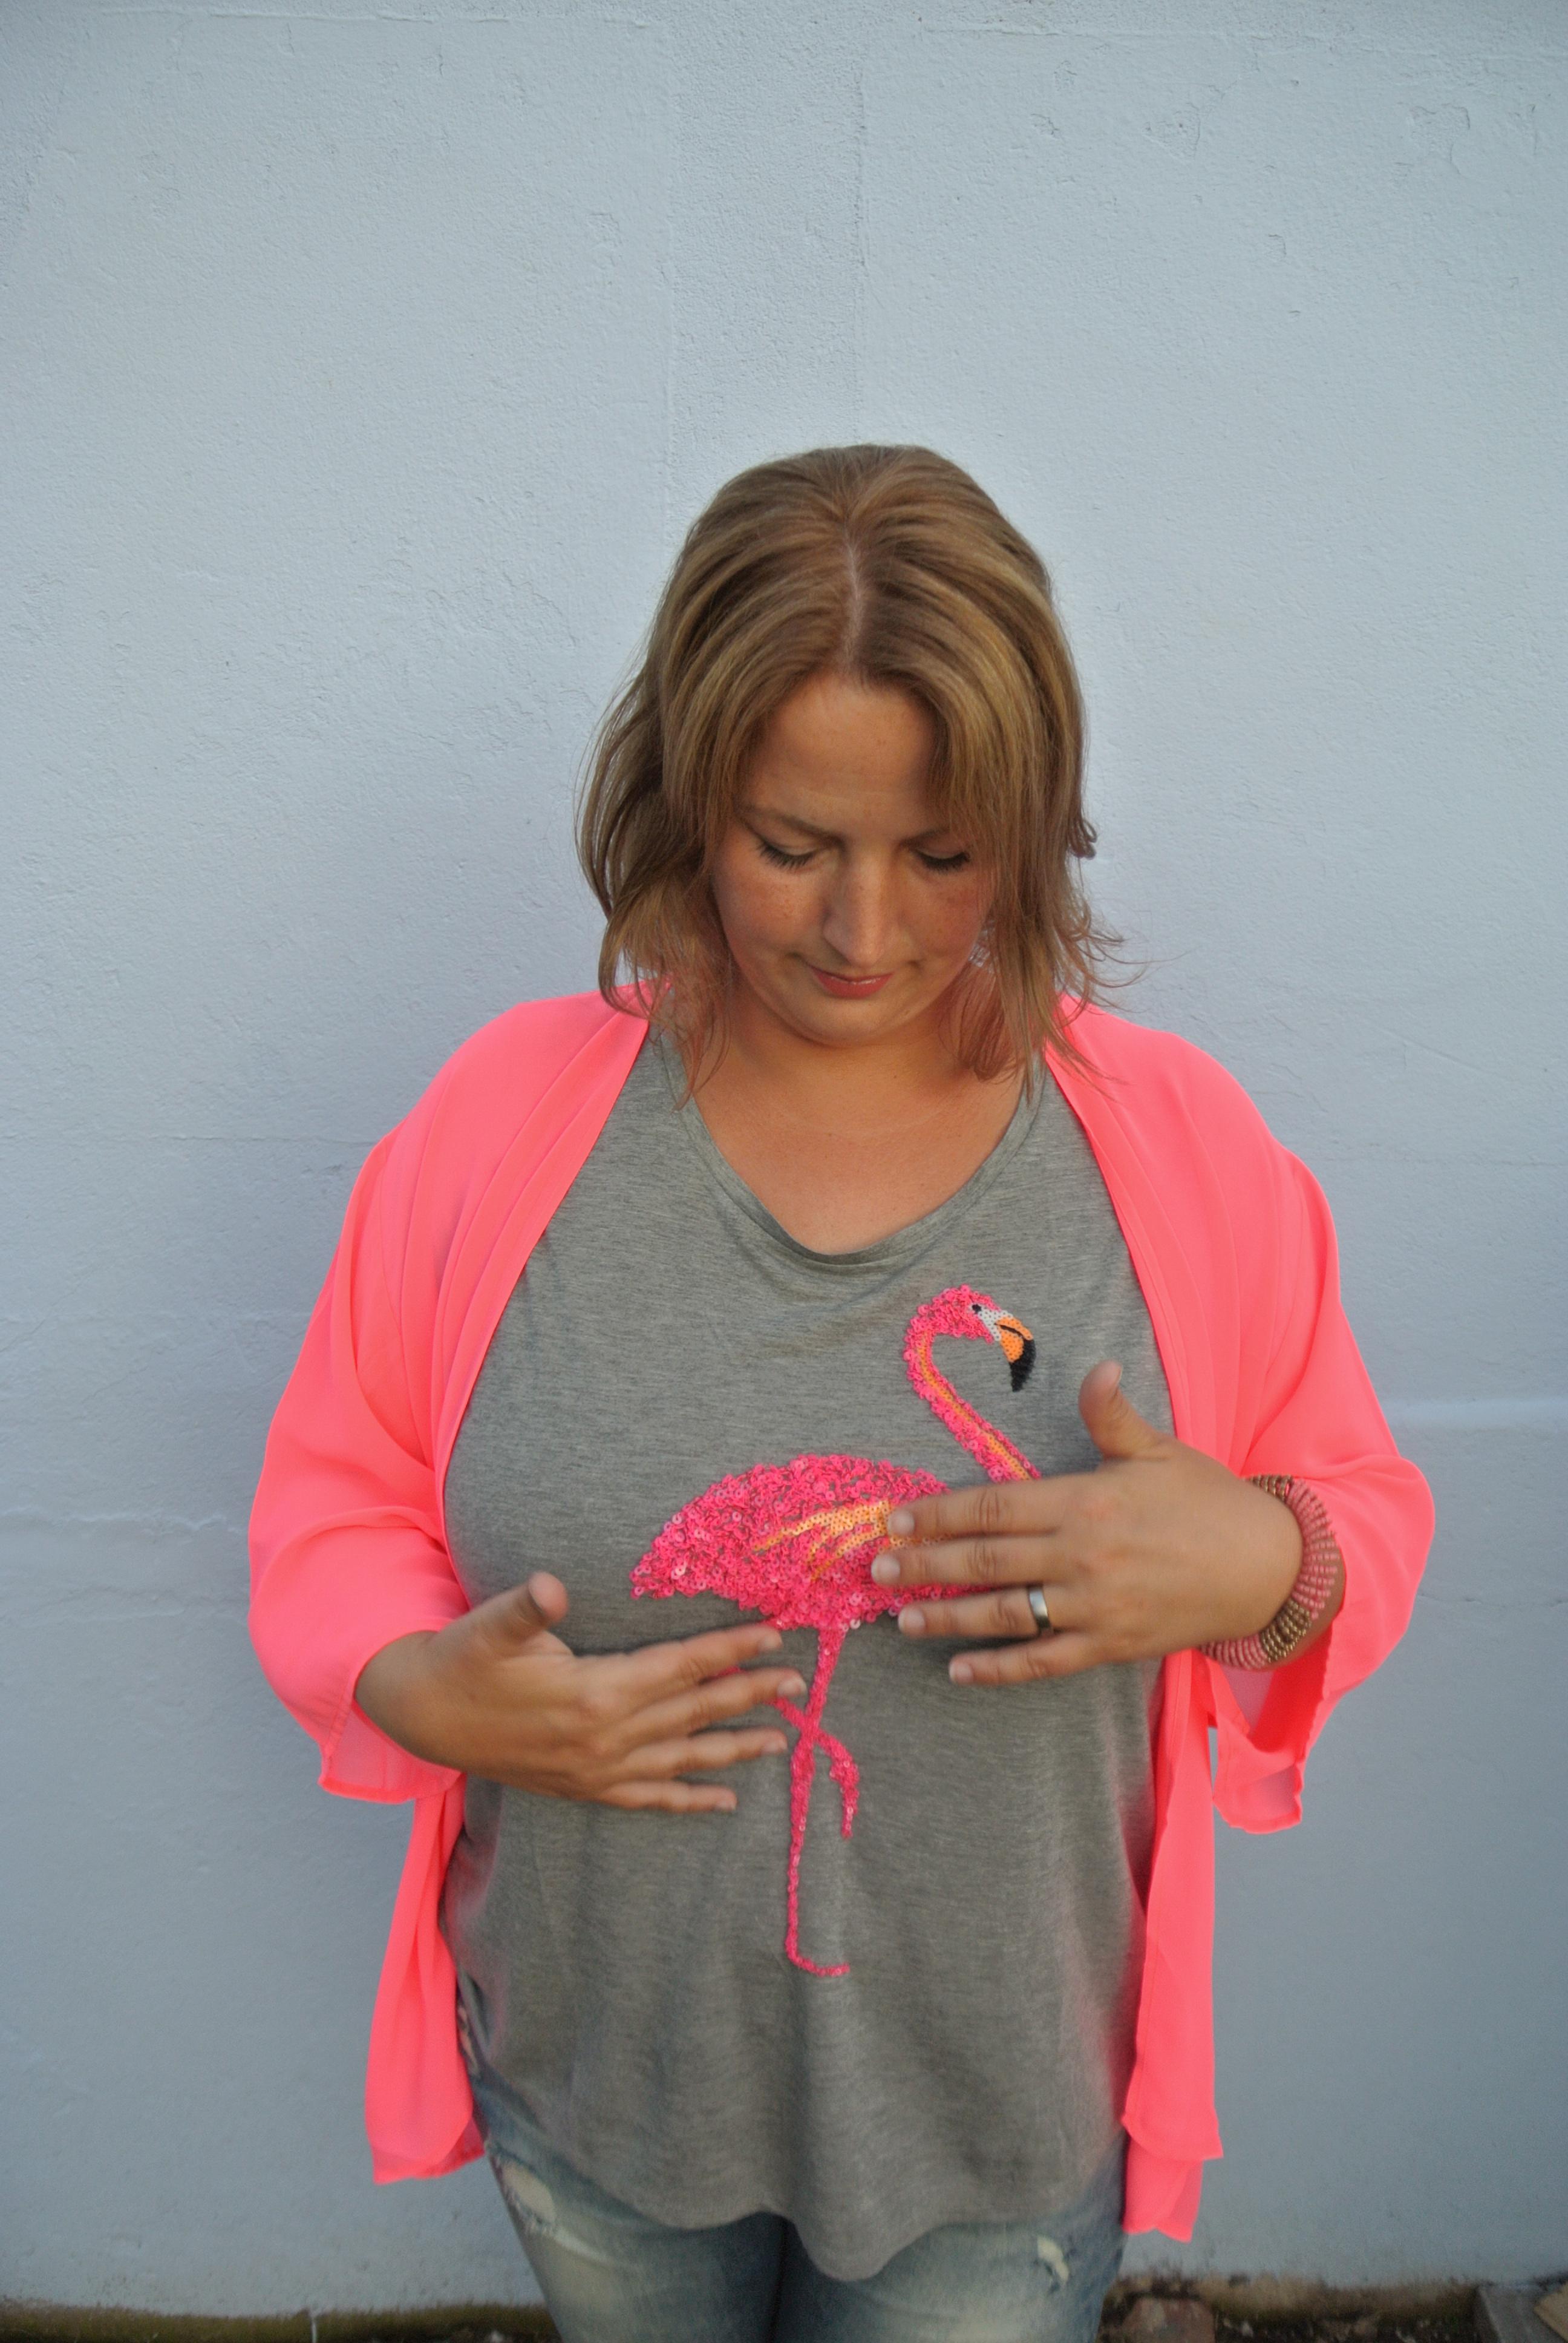 Flamingo-T-Shirt